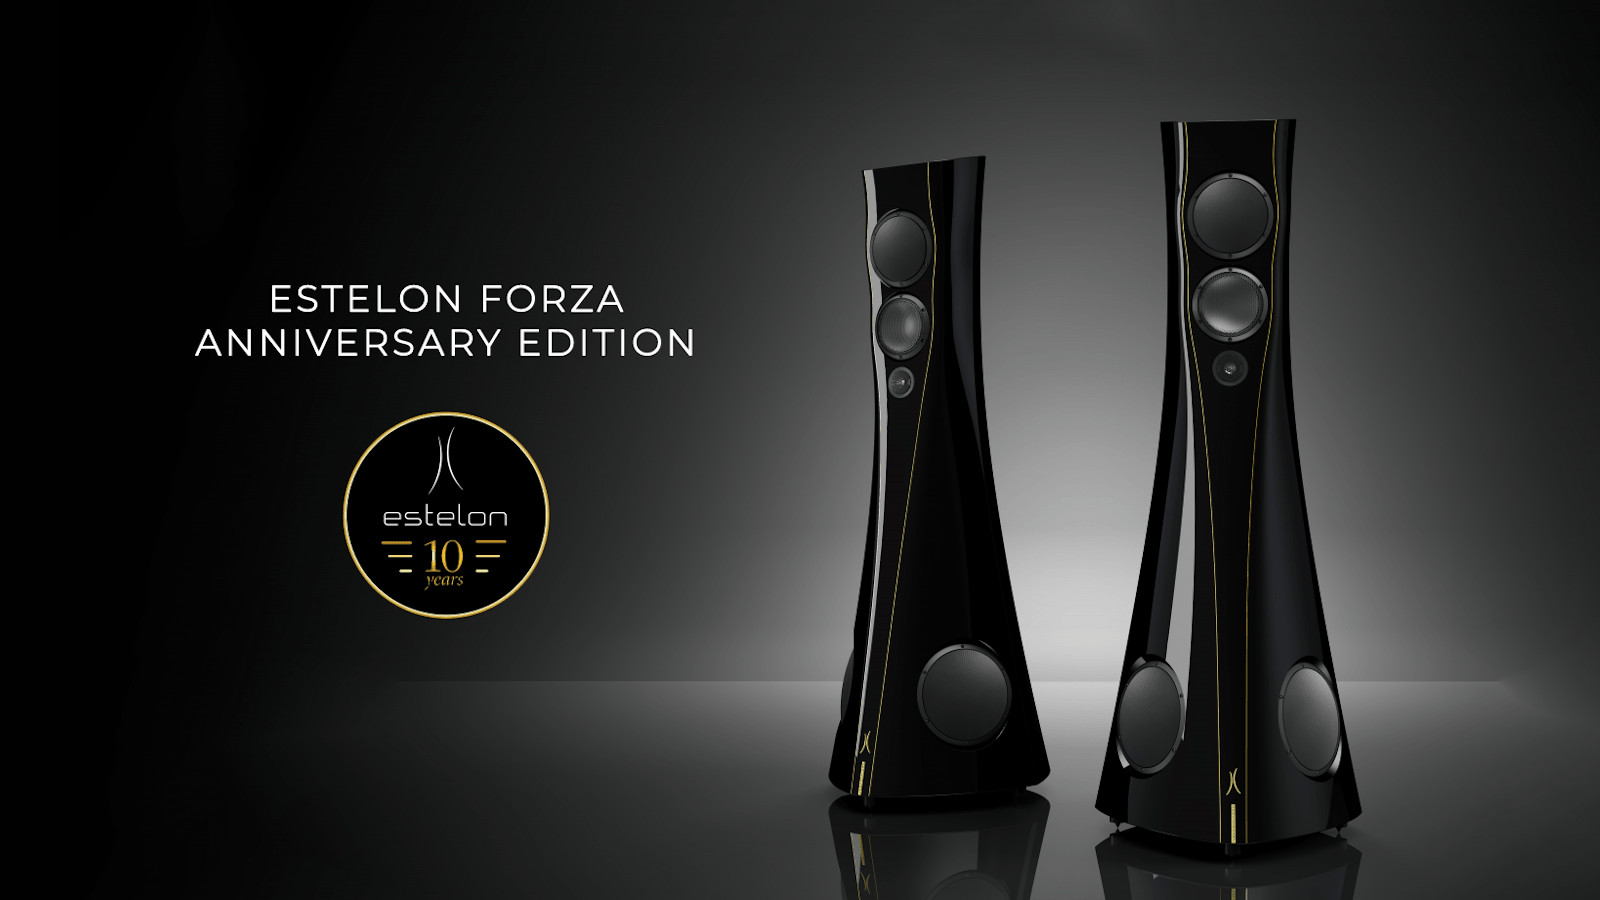 estelon-forza-anniversary-edition